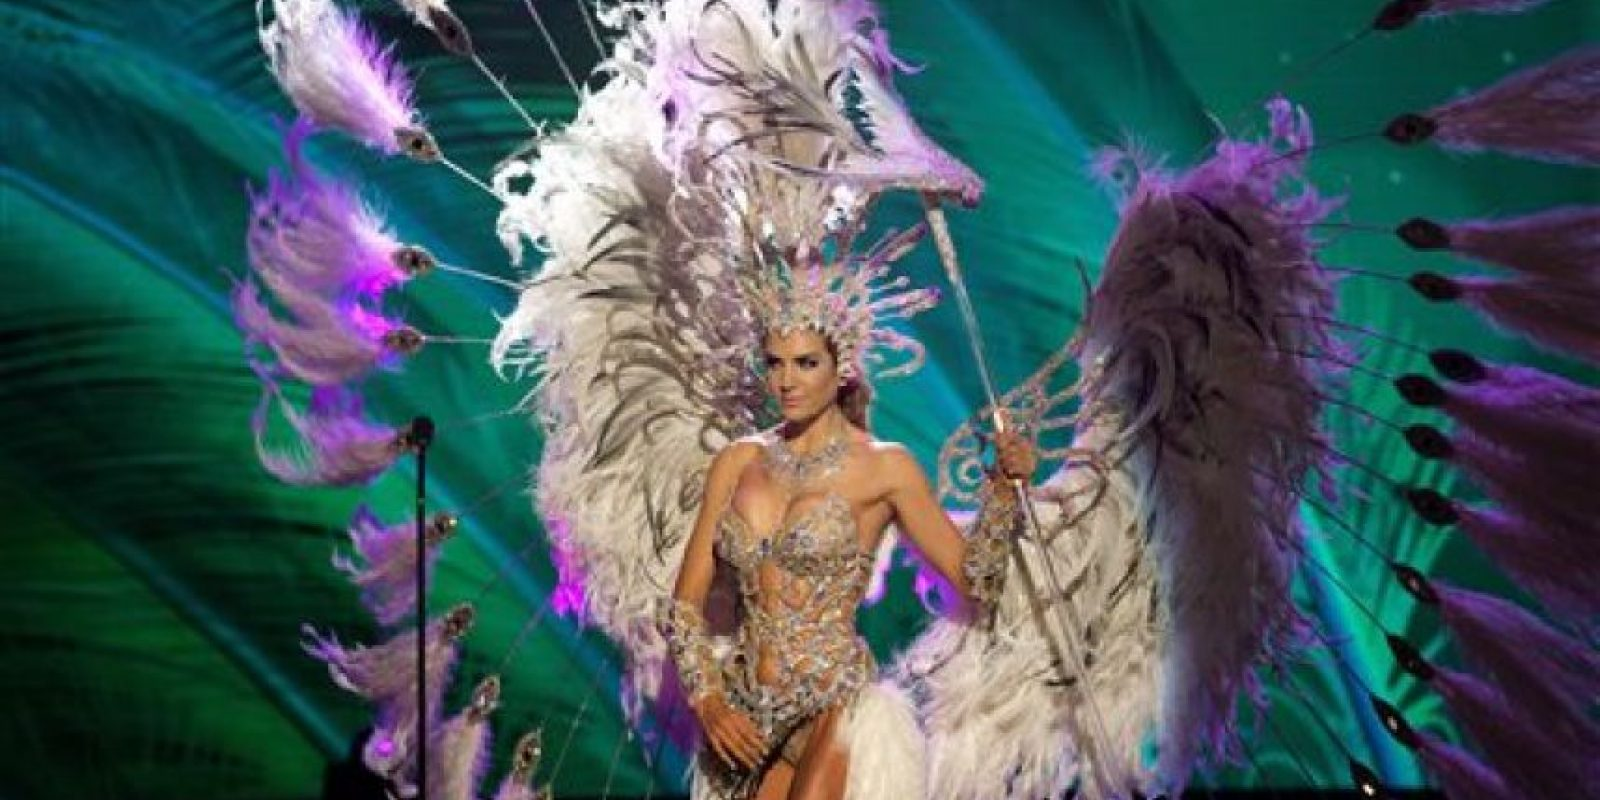 Valentina Ferrer, Miss Argentina Foto:AP